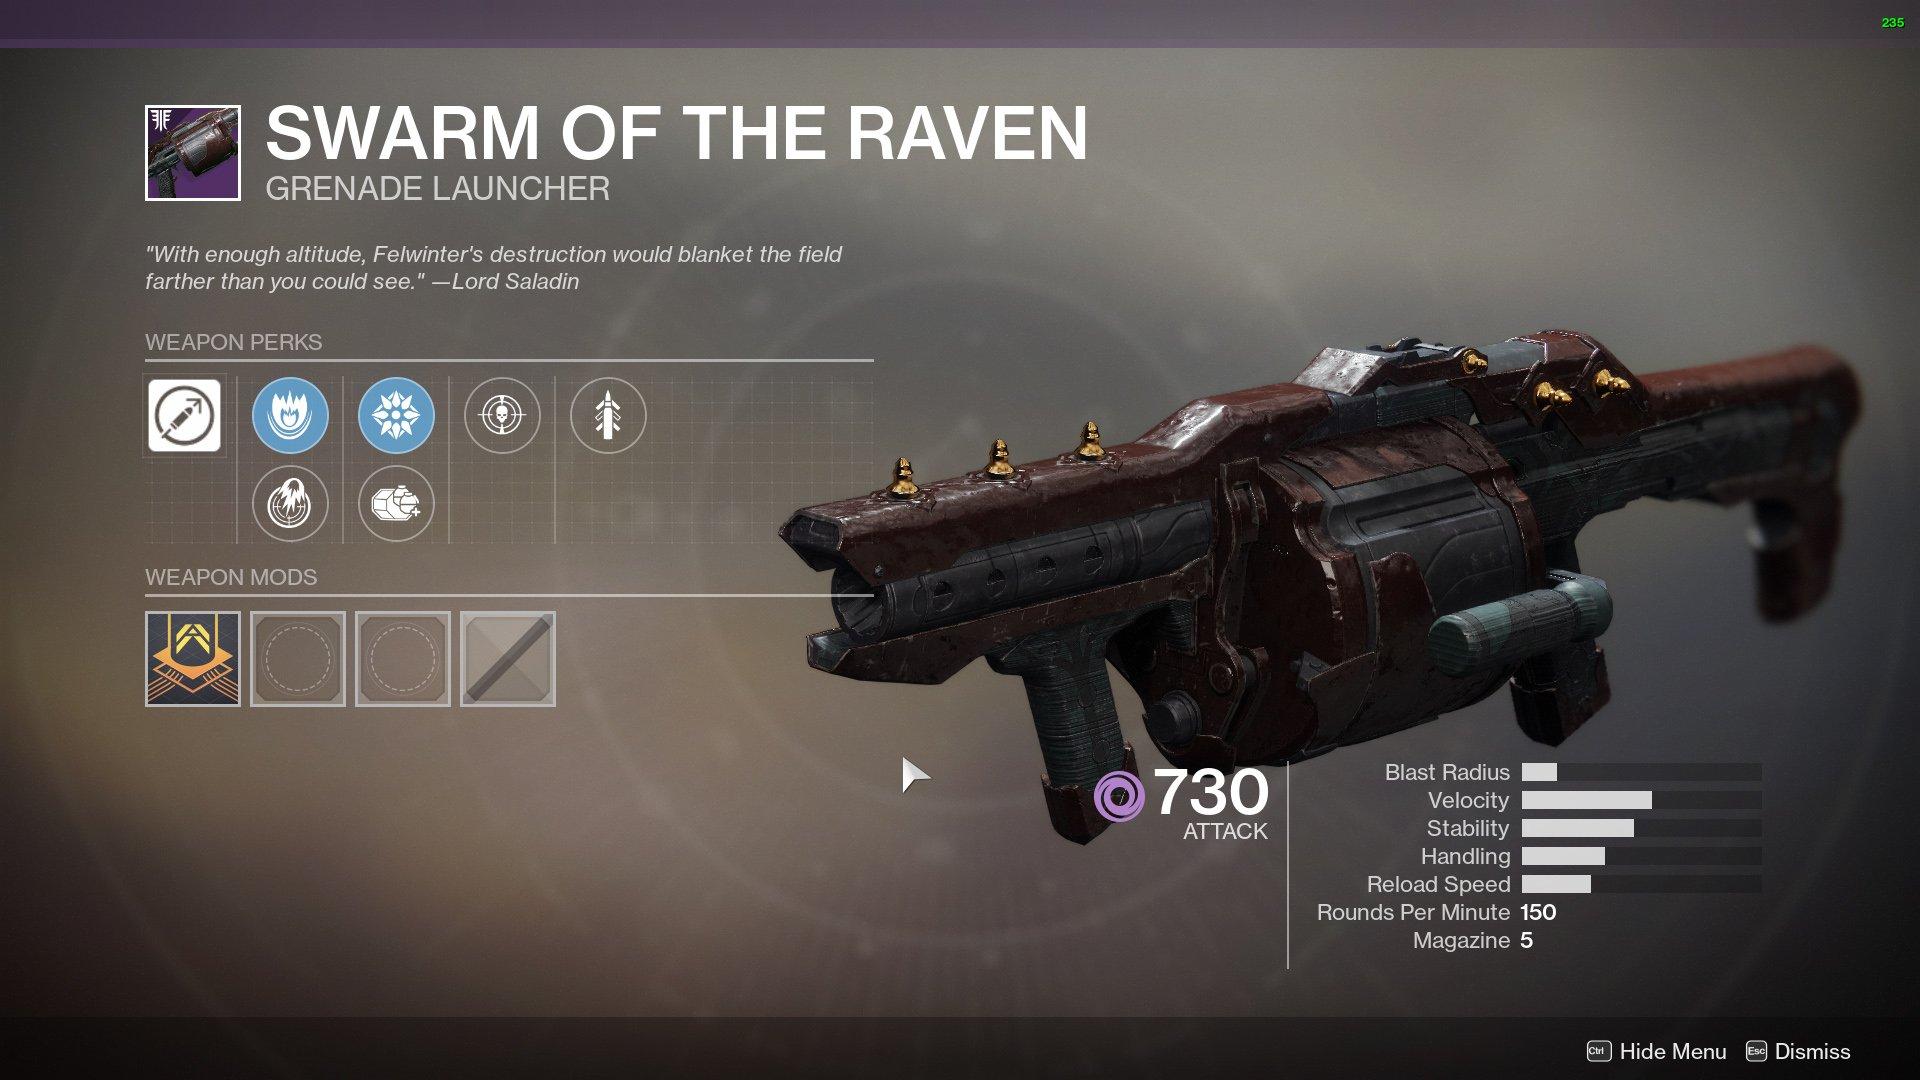 Swarm of the Raven